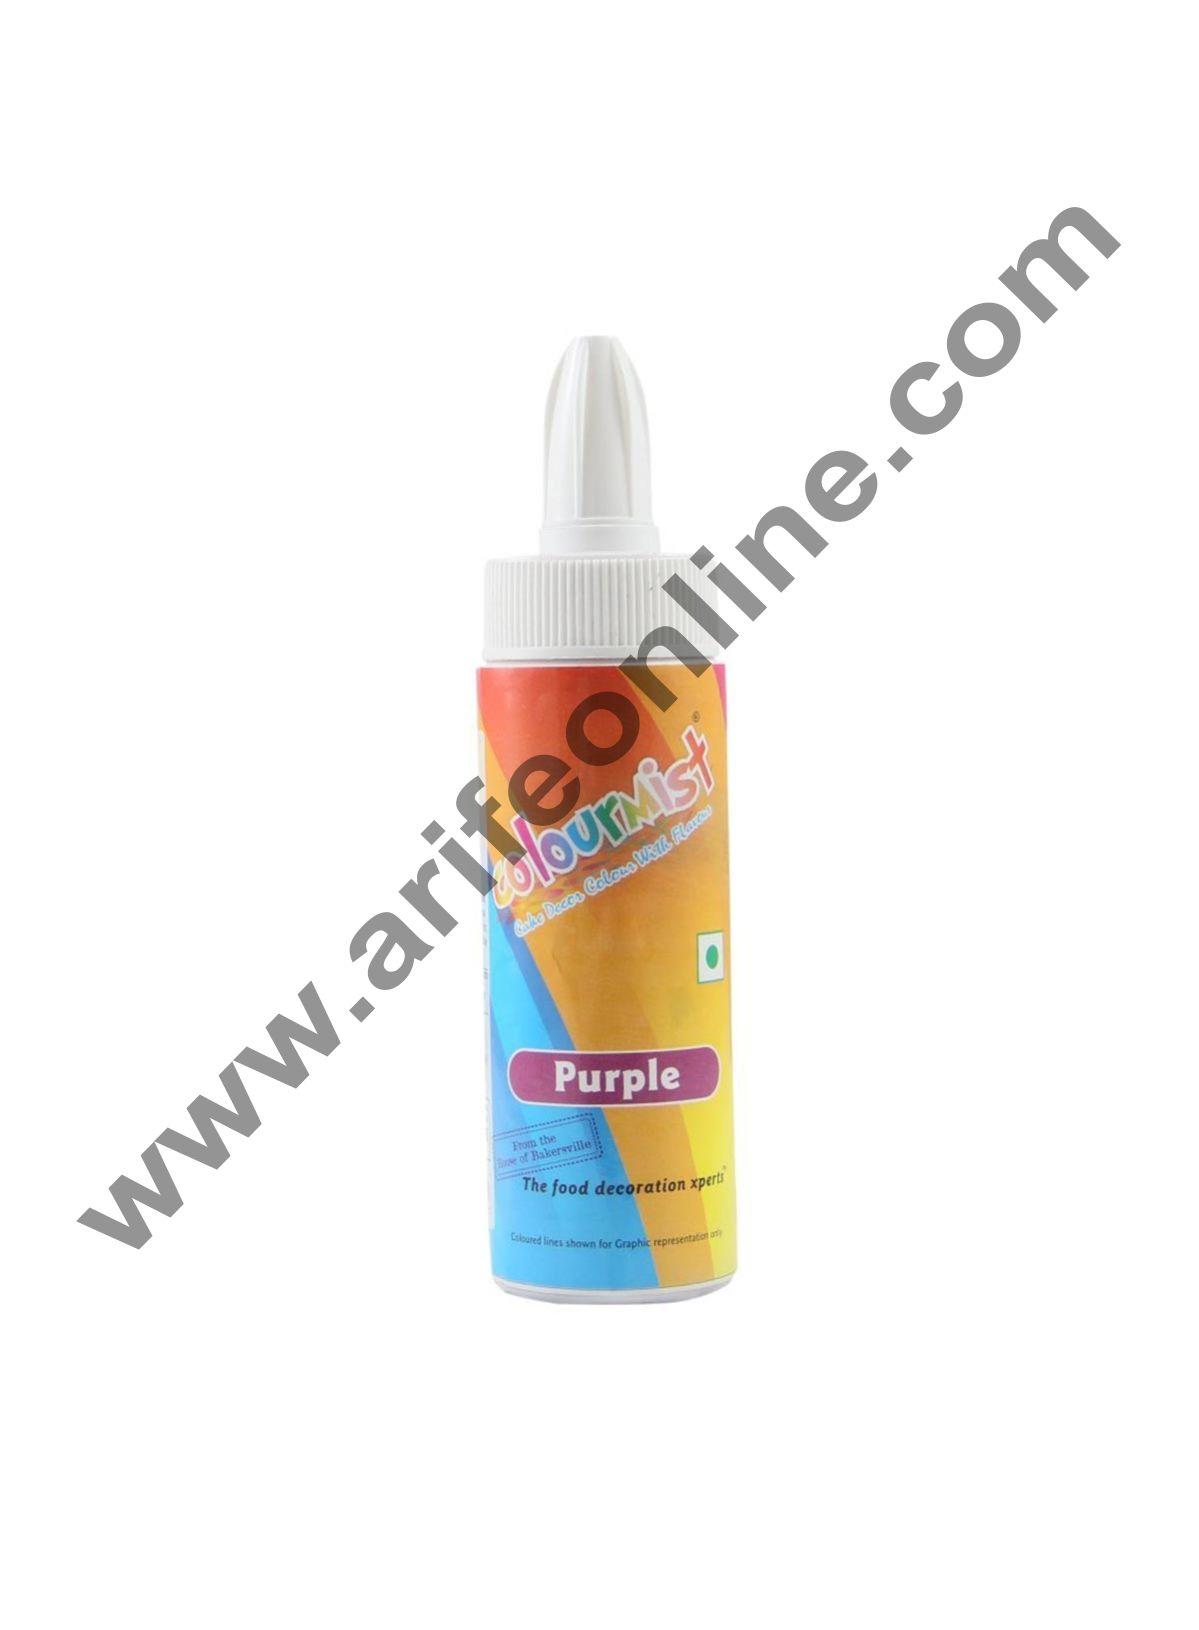 Colourmist Powder Spray (Purple), 60gm